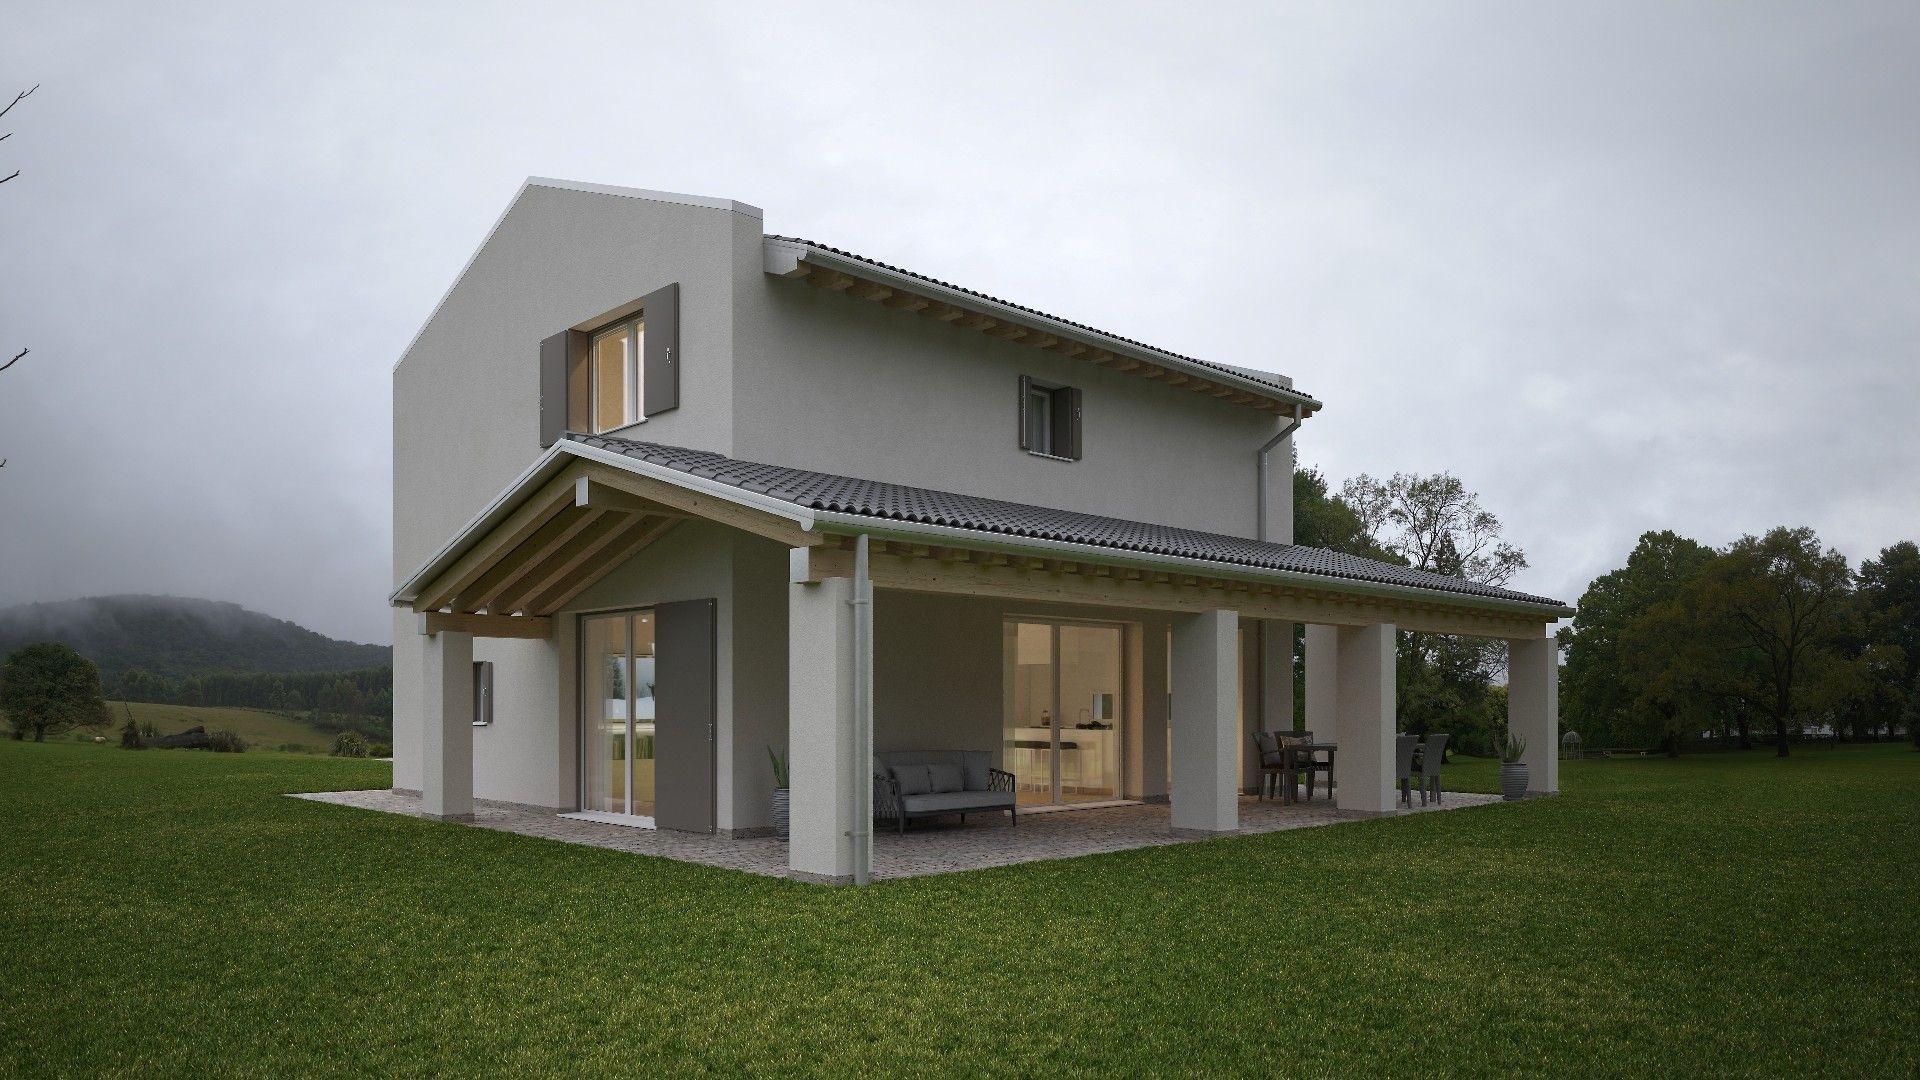 Case A Due Piani casa in legno moderna a due piani | case di legno, design